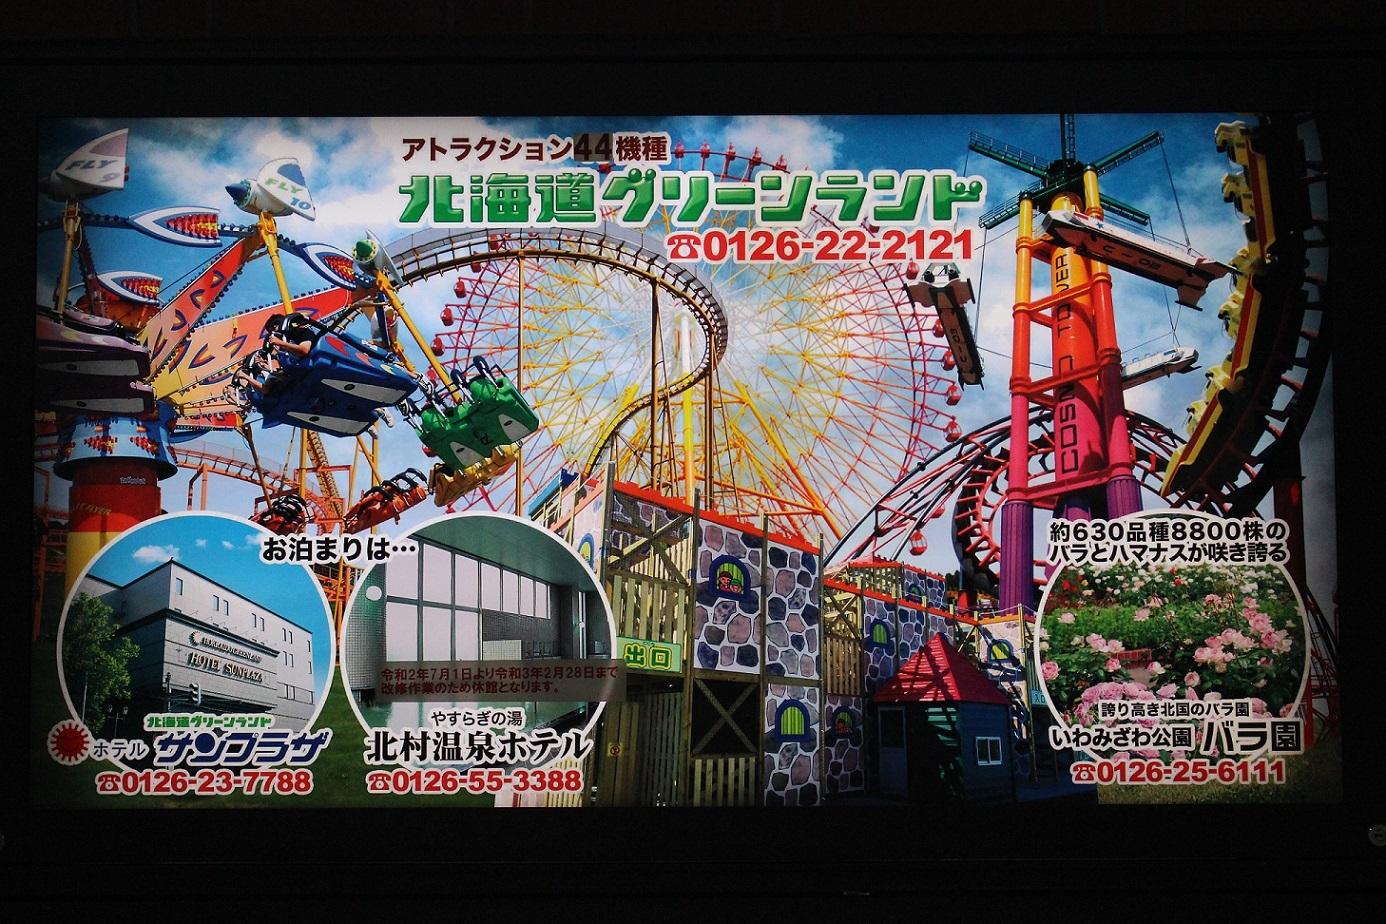 岩見沢駅a124